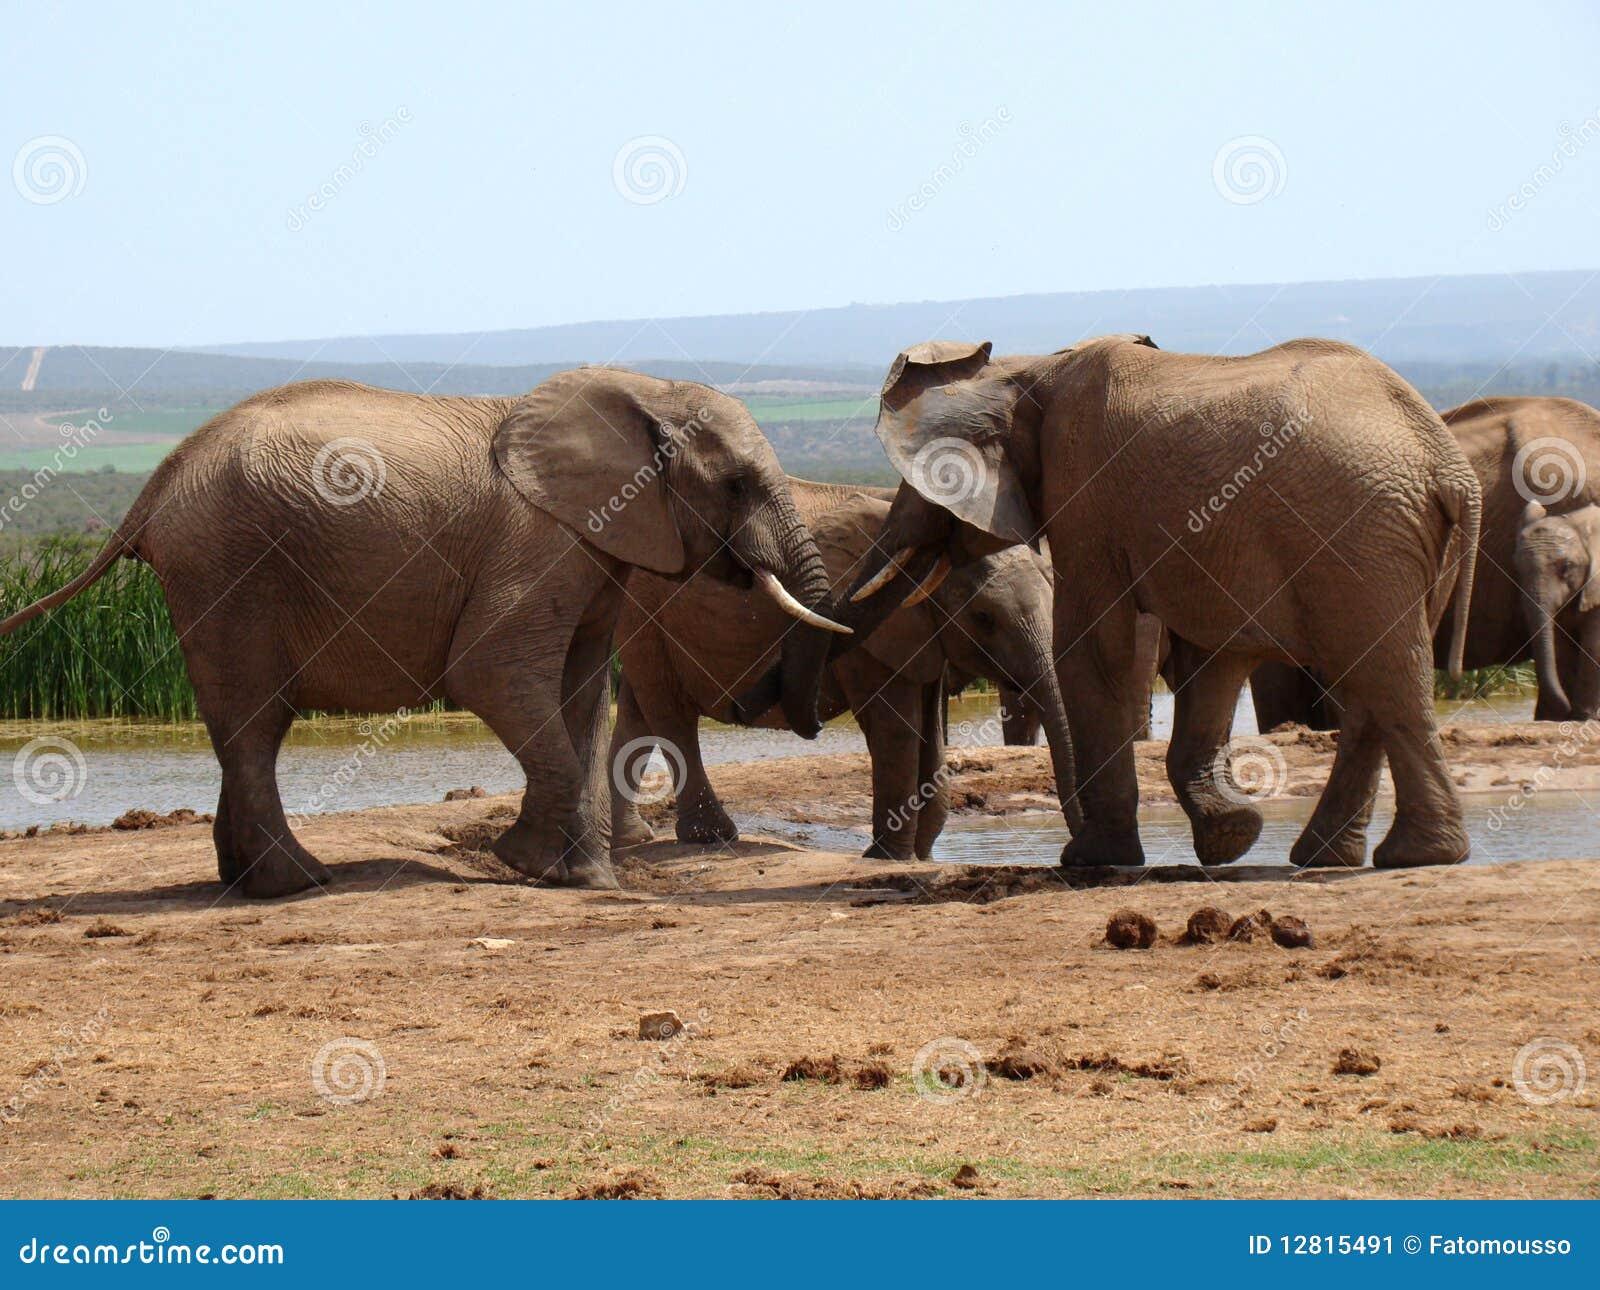 large african bull elephant royalty free stock photos - image